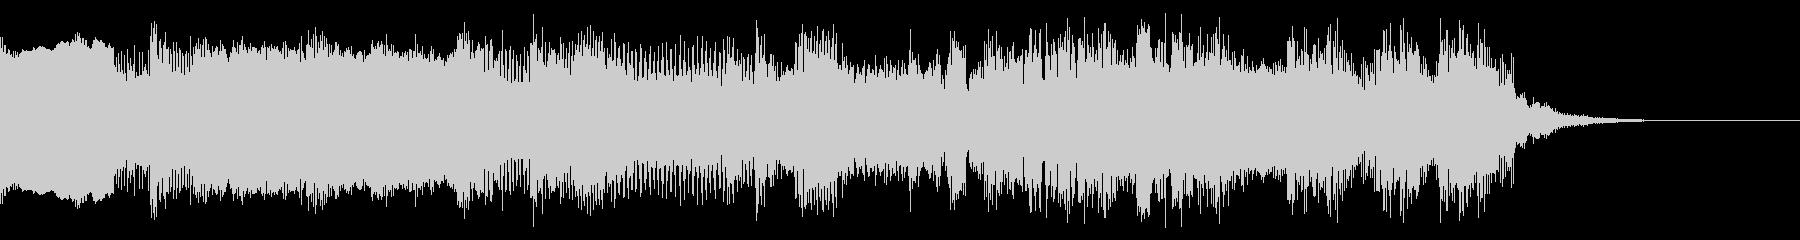 8bit エンディング系のジングルの未再生の波形